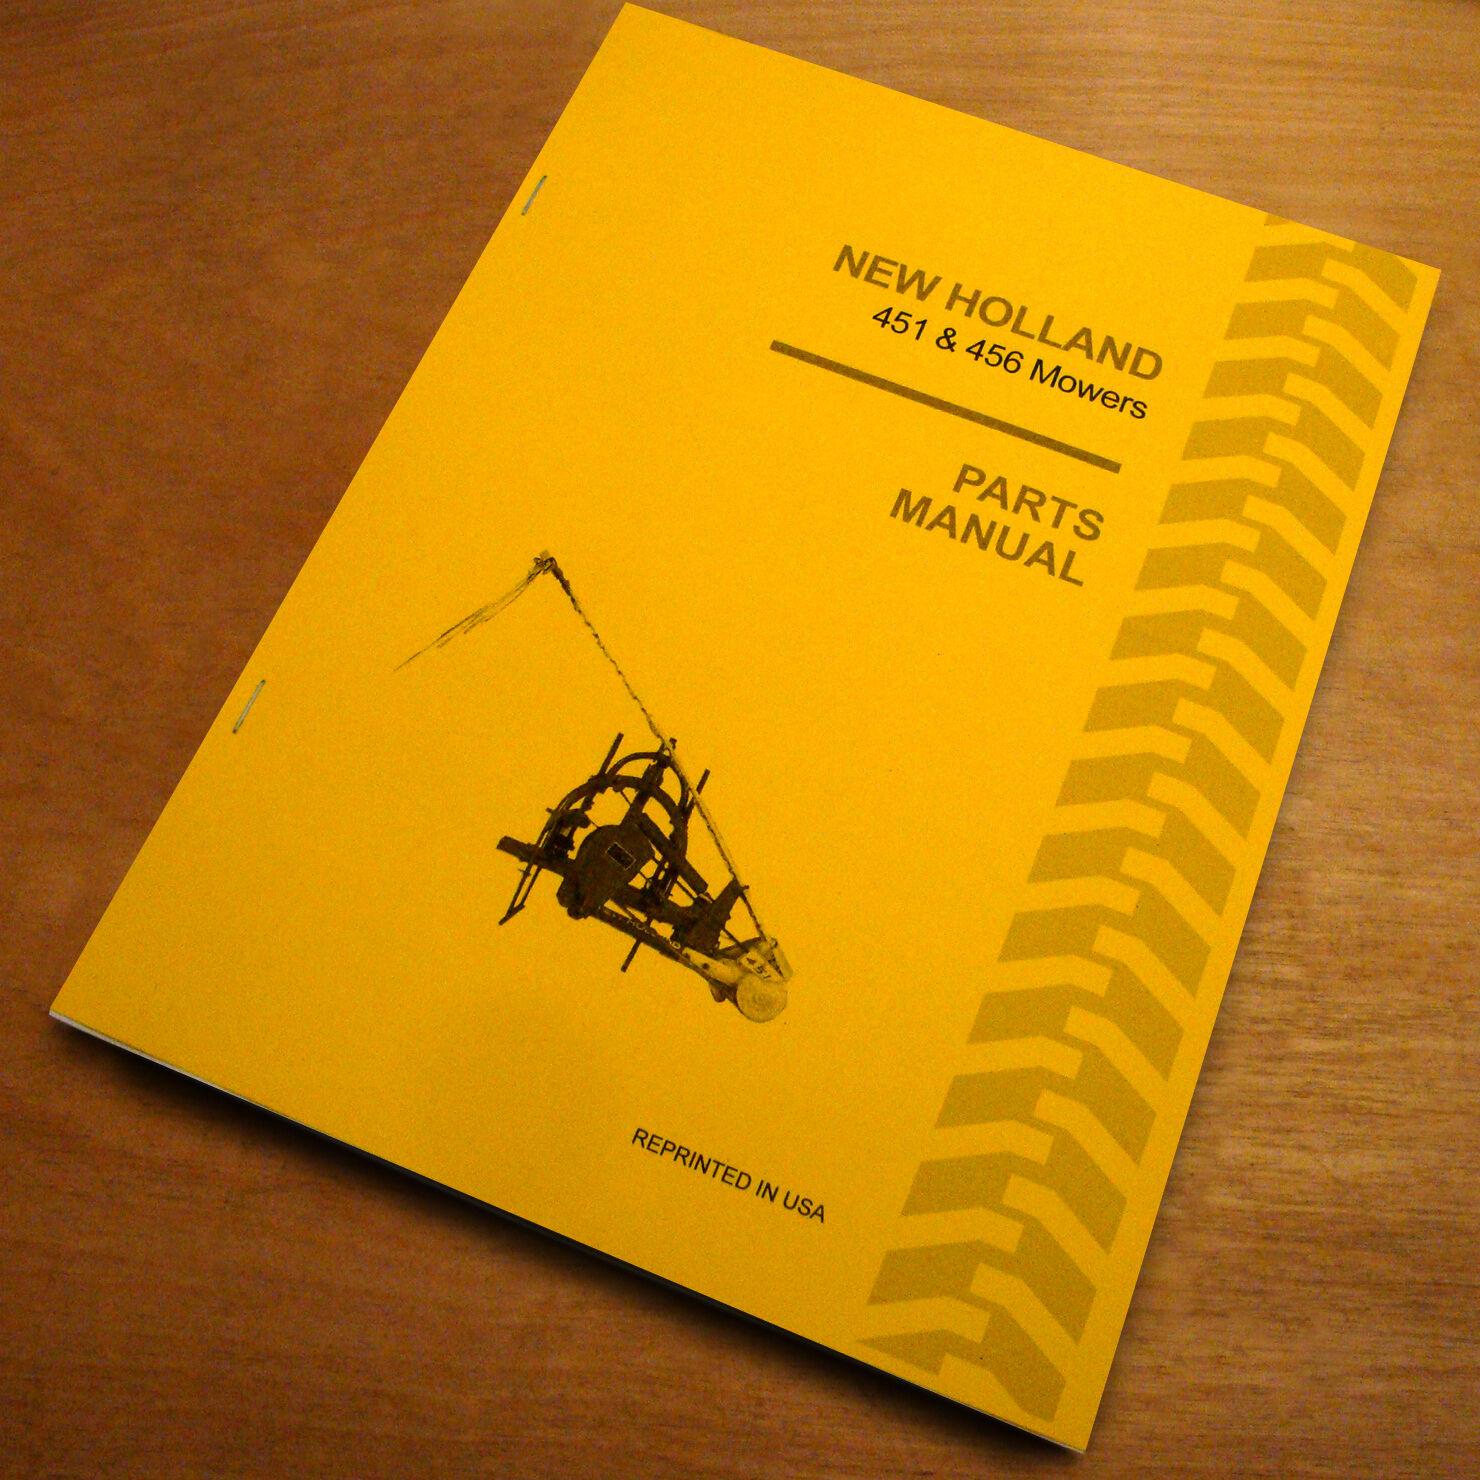 New Holland 451 456 Sickle Bar Hay Mower Parts Catalog